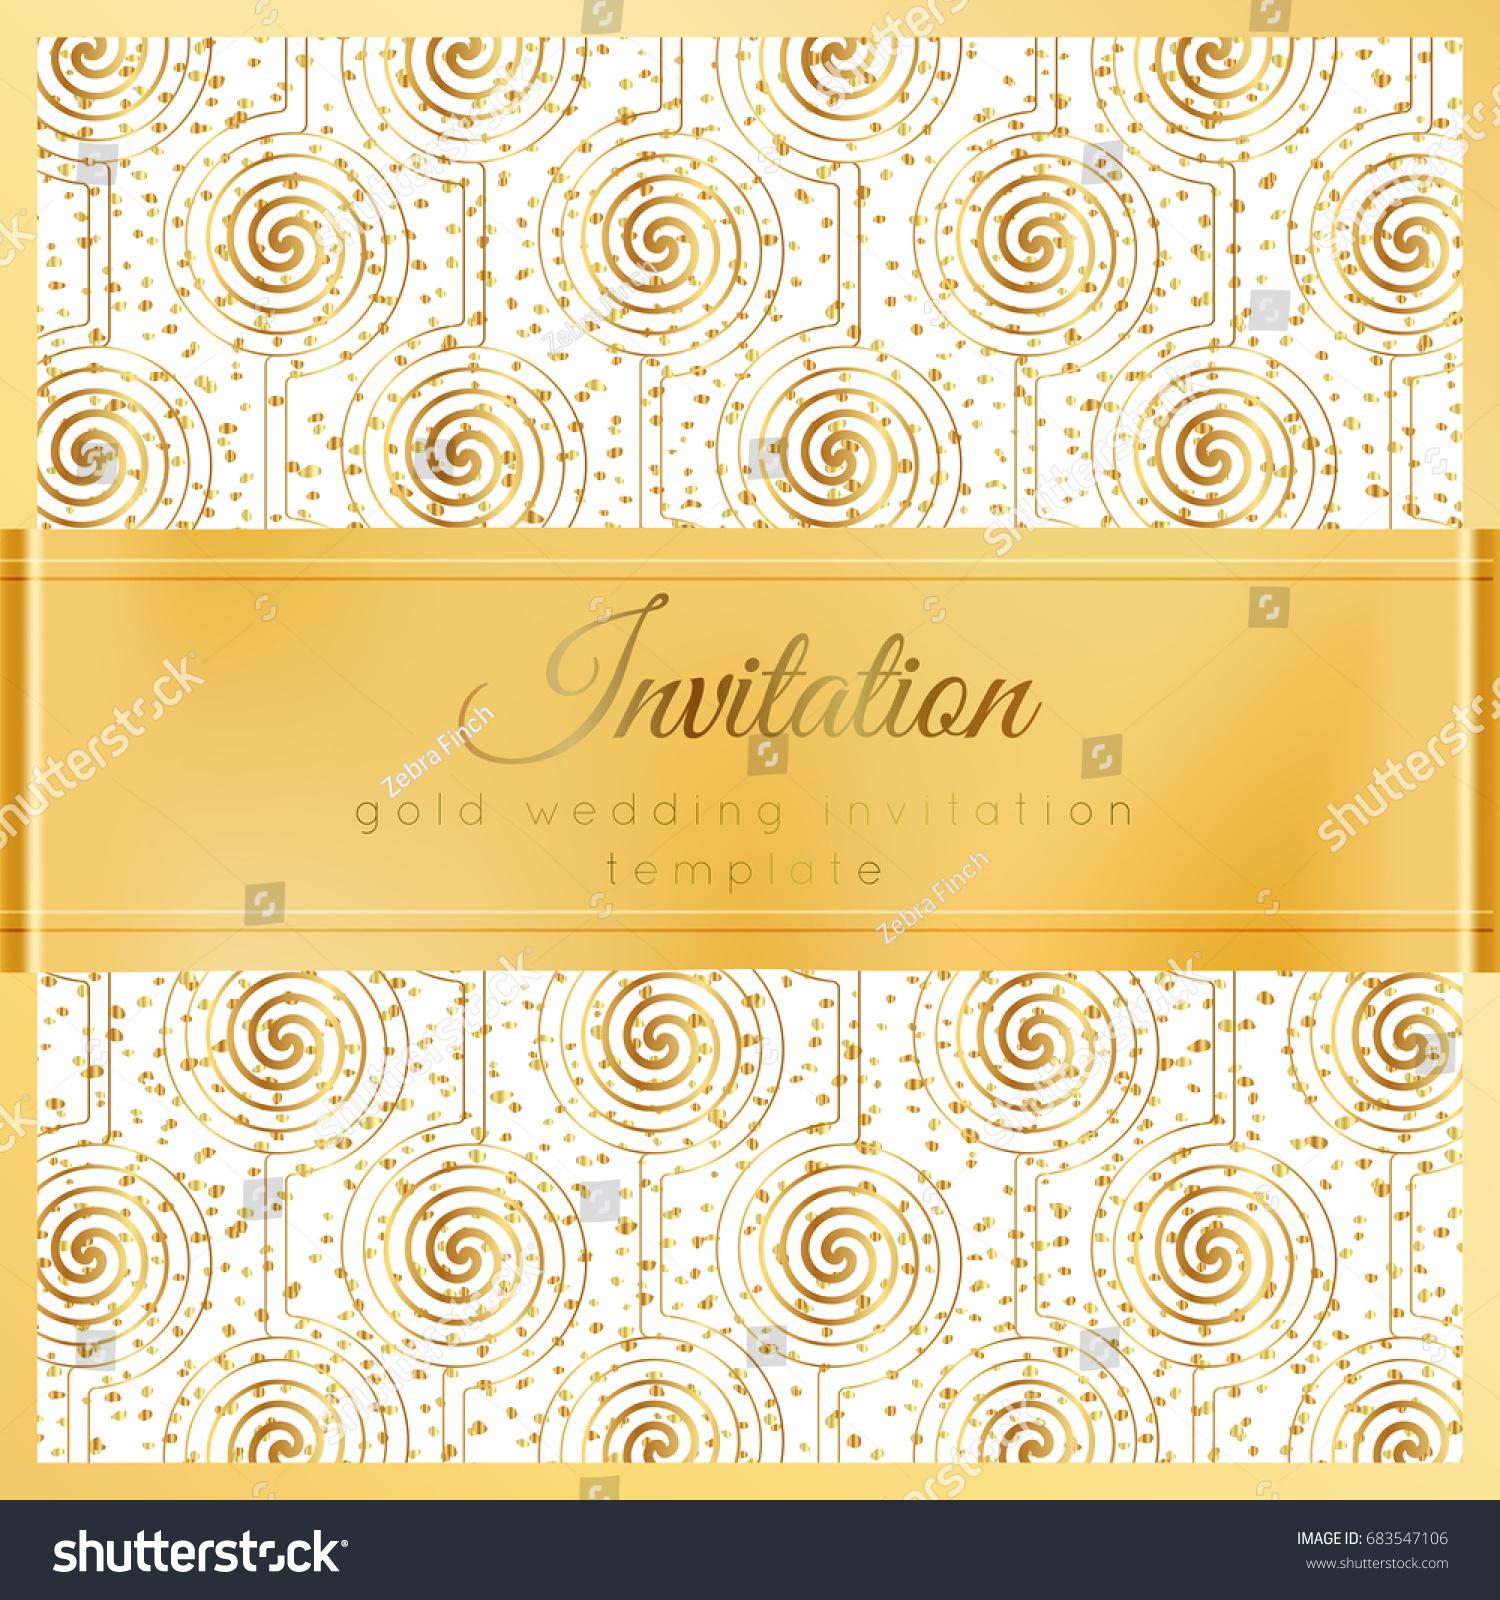 Luxury Wedding Invitation Template Gold Shiny Stock Vector ...